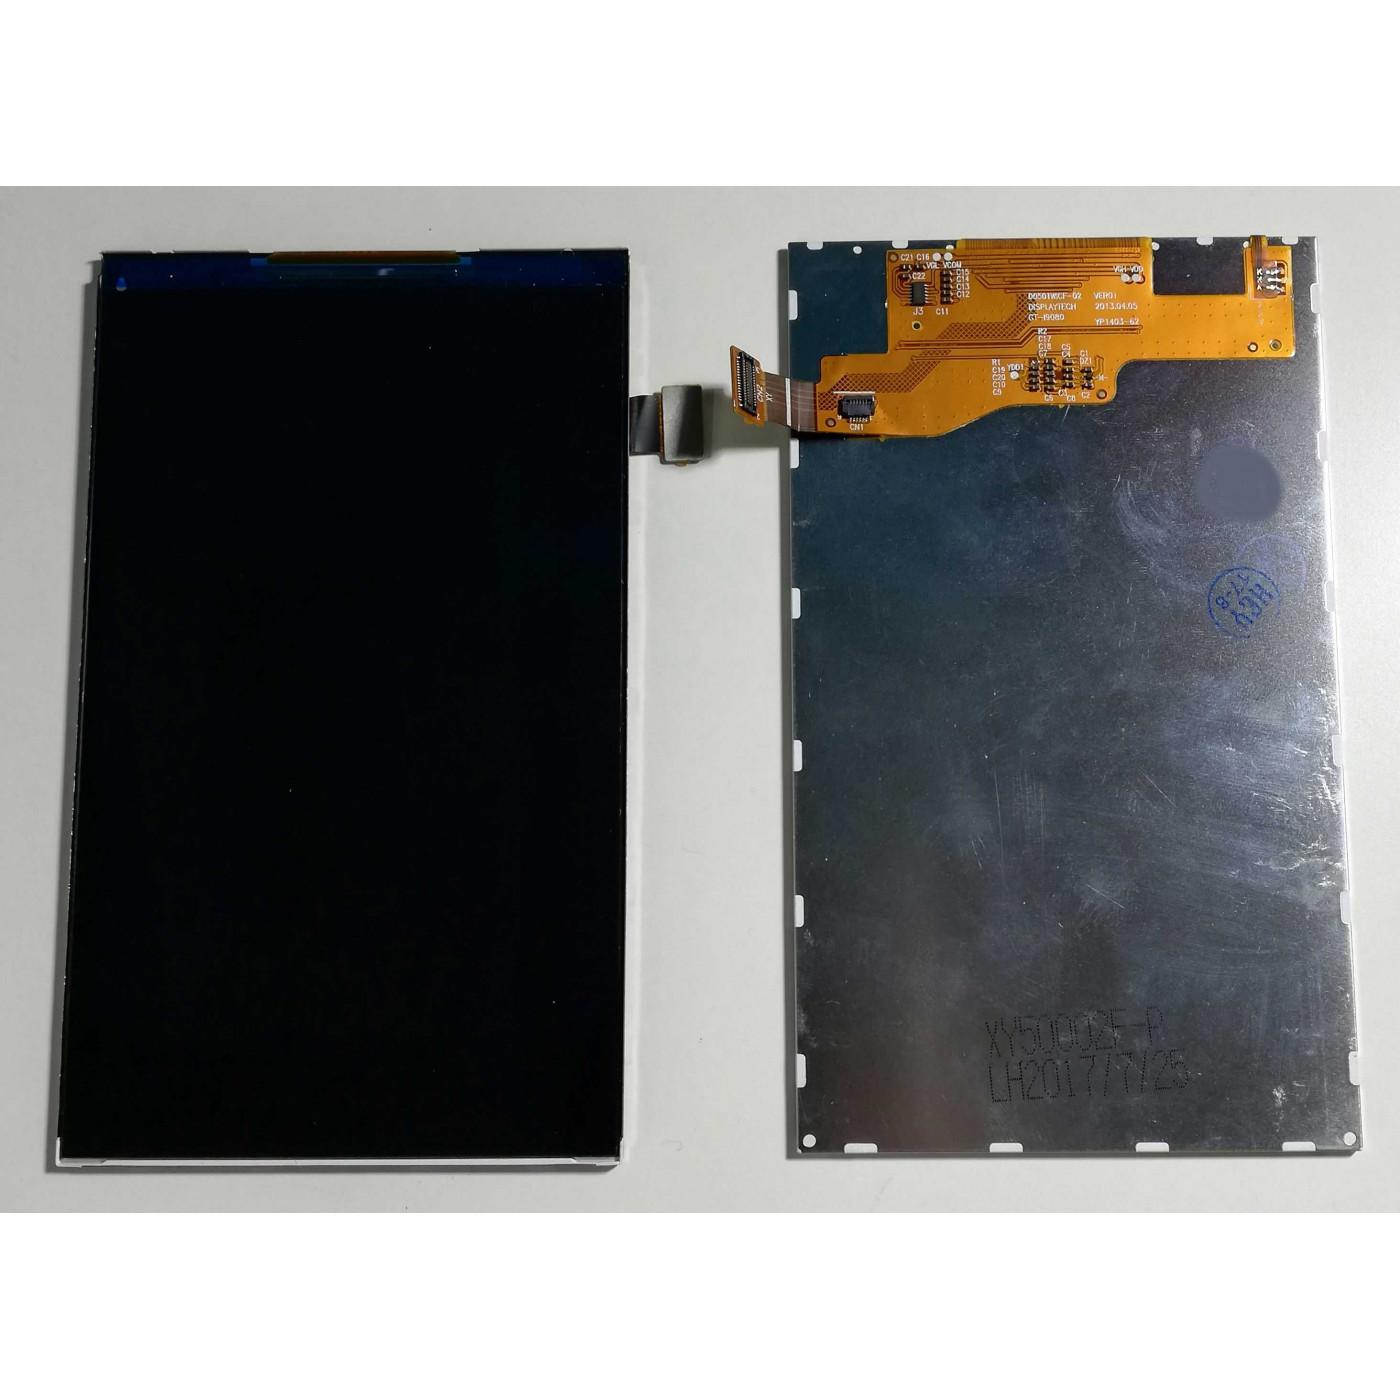 Pantalla LCD para Samsung Galaxy Grand Neo Plus GT-i9060 i9060i i9082